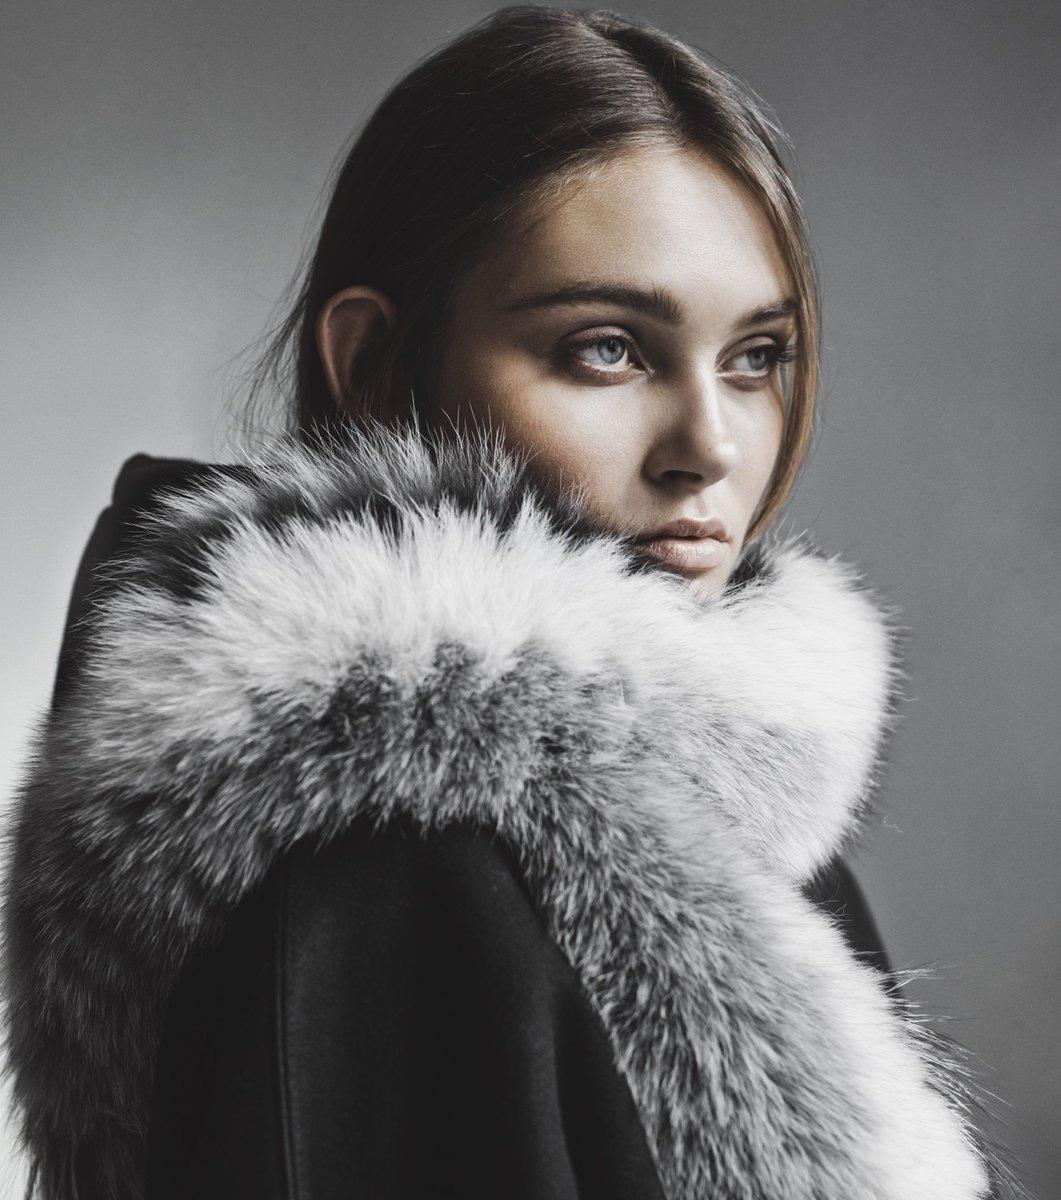 88a717b11d53a4 #gemmifurhouse #furscarf #furaccessory #finnishdesign #fur #furs  #furfashion #furlove #furlovers #pelz #pelzweste #pelzmode #style  #fashionpic.twitter.com/ ...